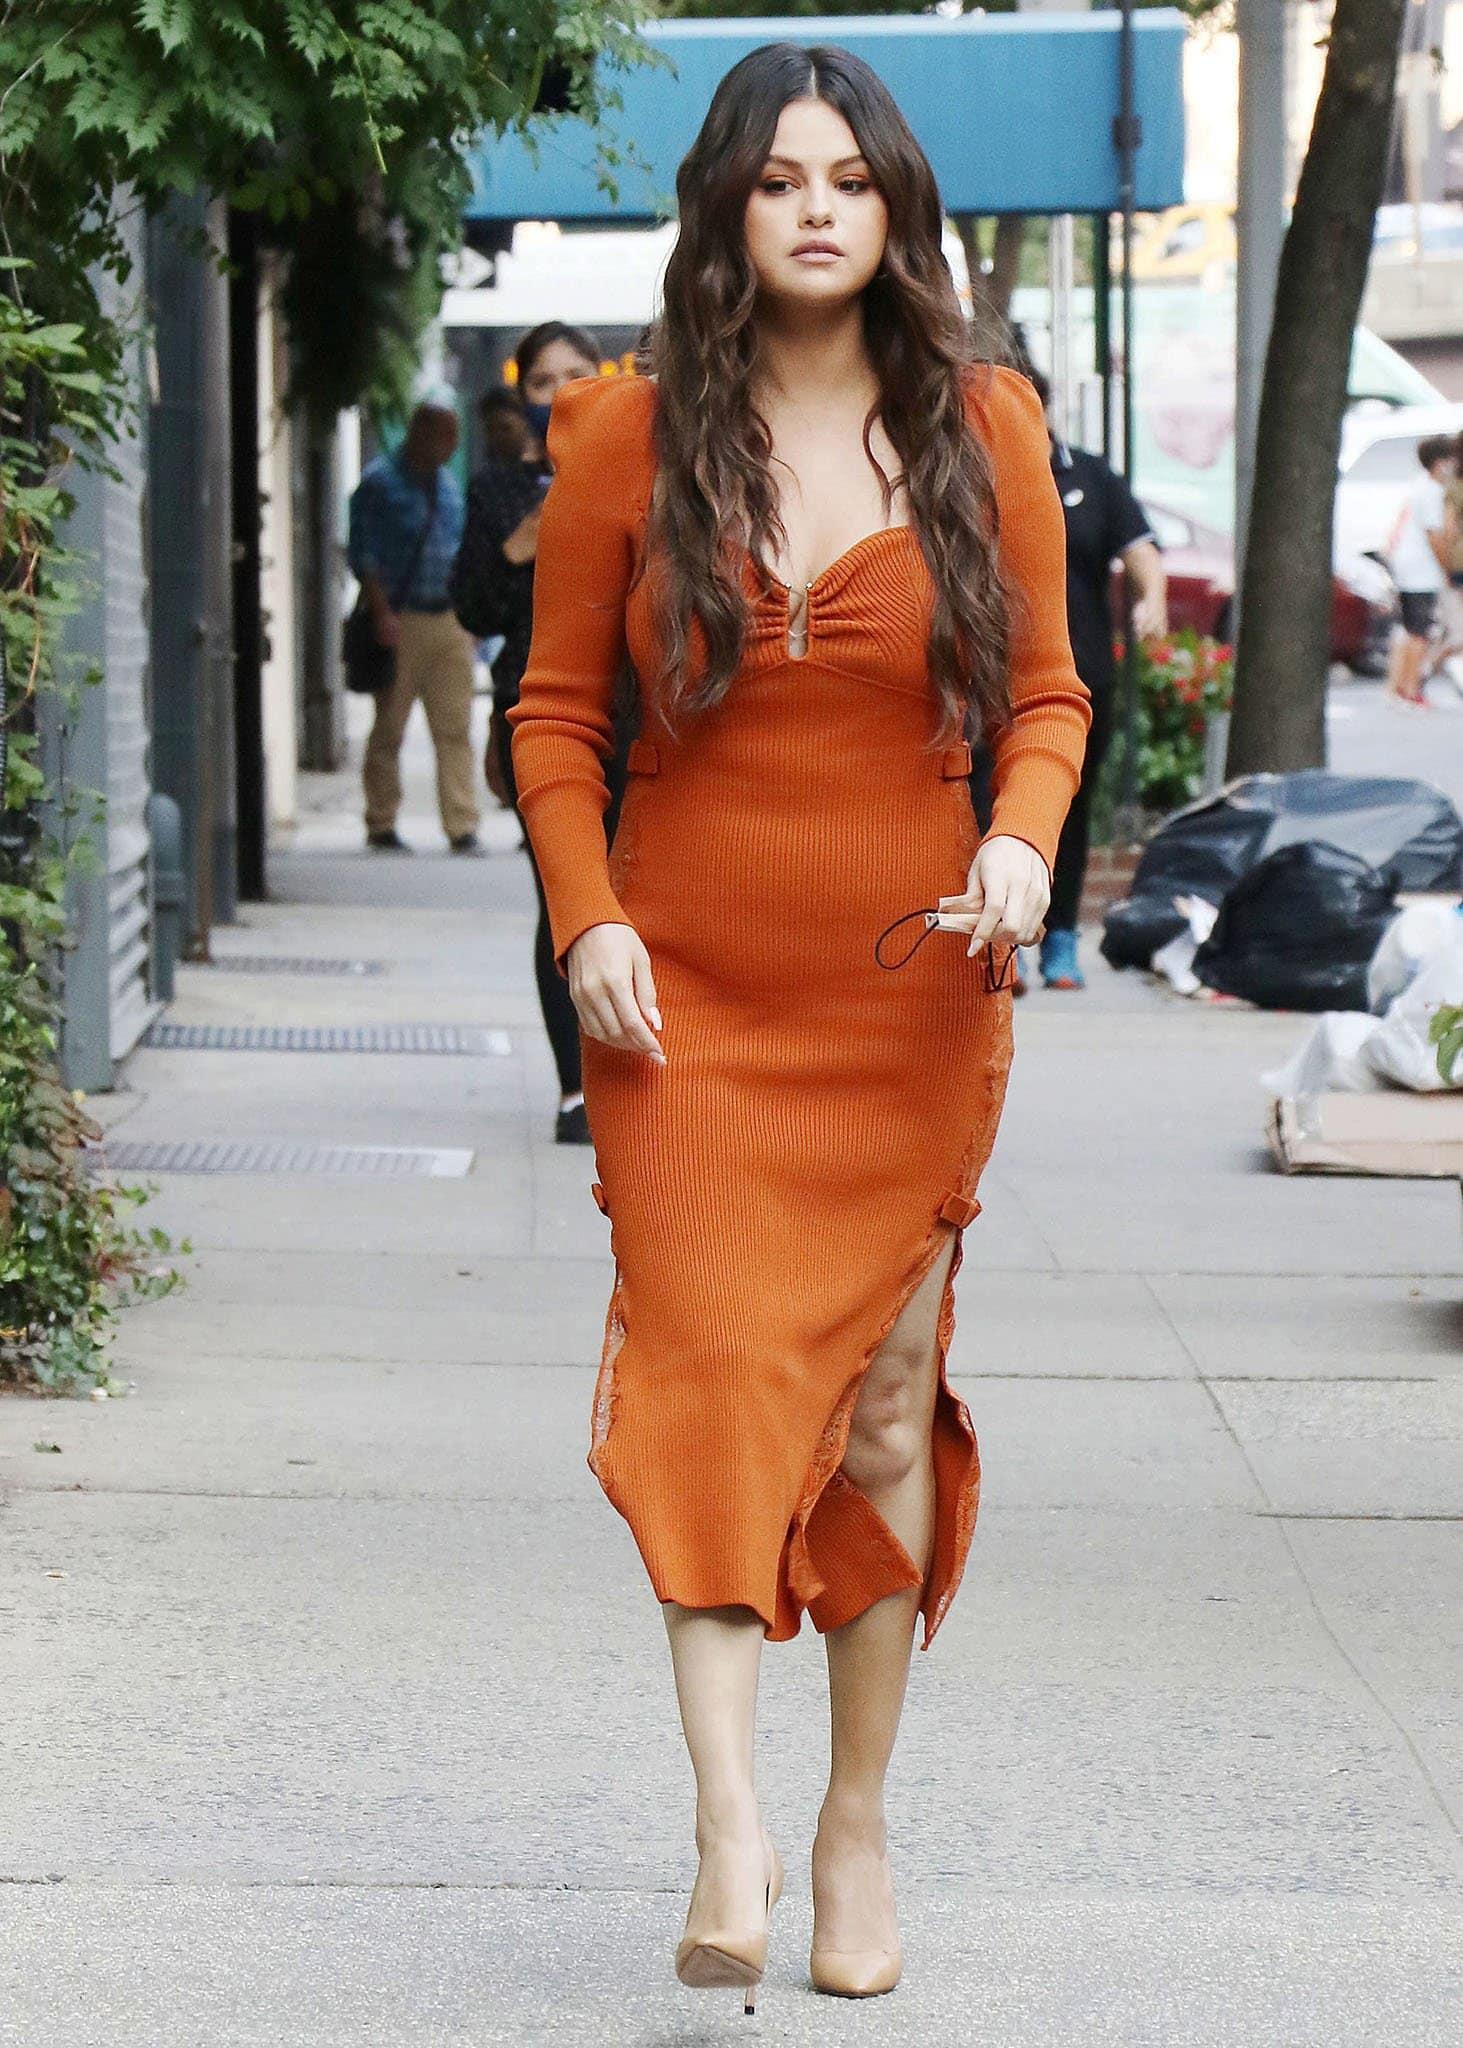 Ice cream entrepreneur Selena Gomez arriving at Serendipity 3 restaurant in New York City